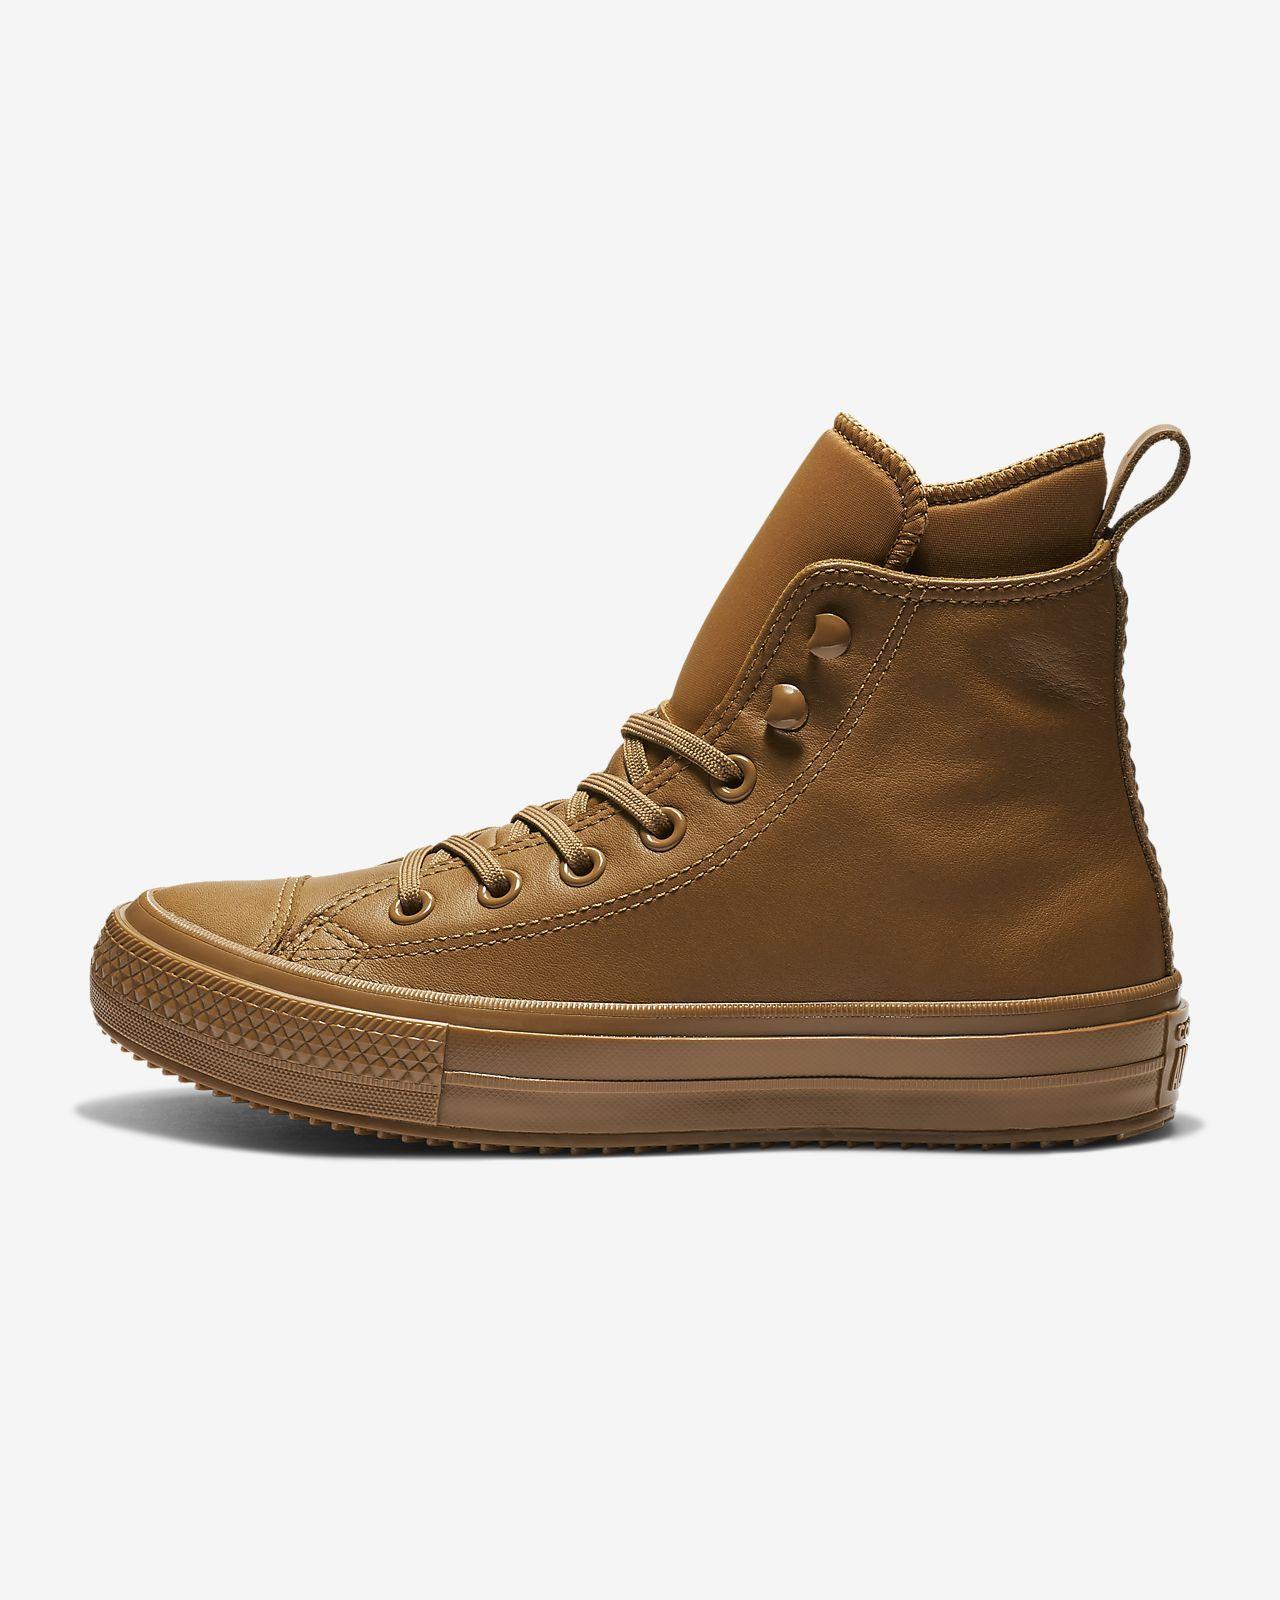 Converse Chuck Taylor All Star Waterproof Leder Hohe Beige